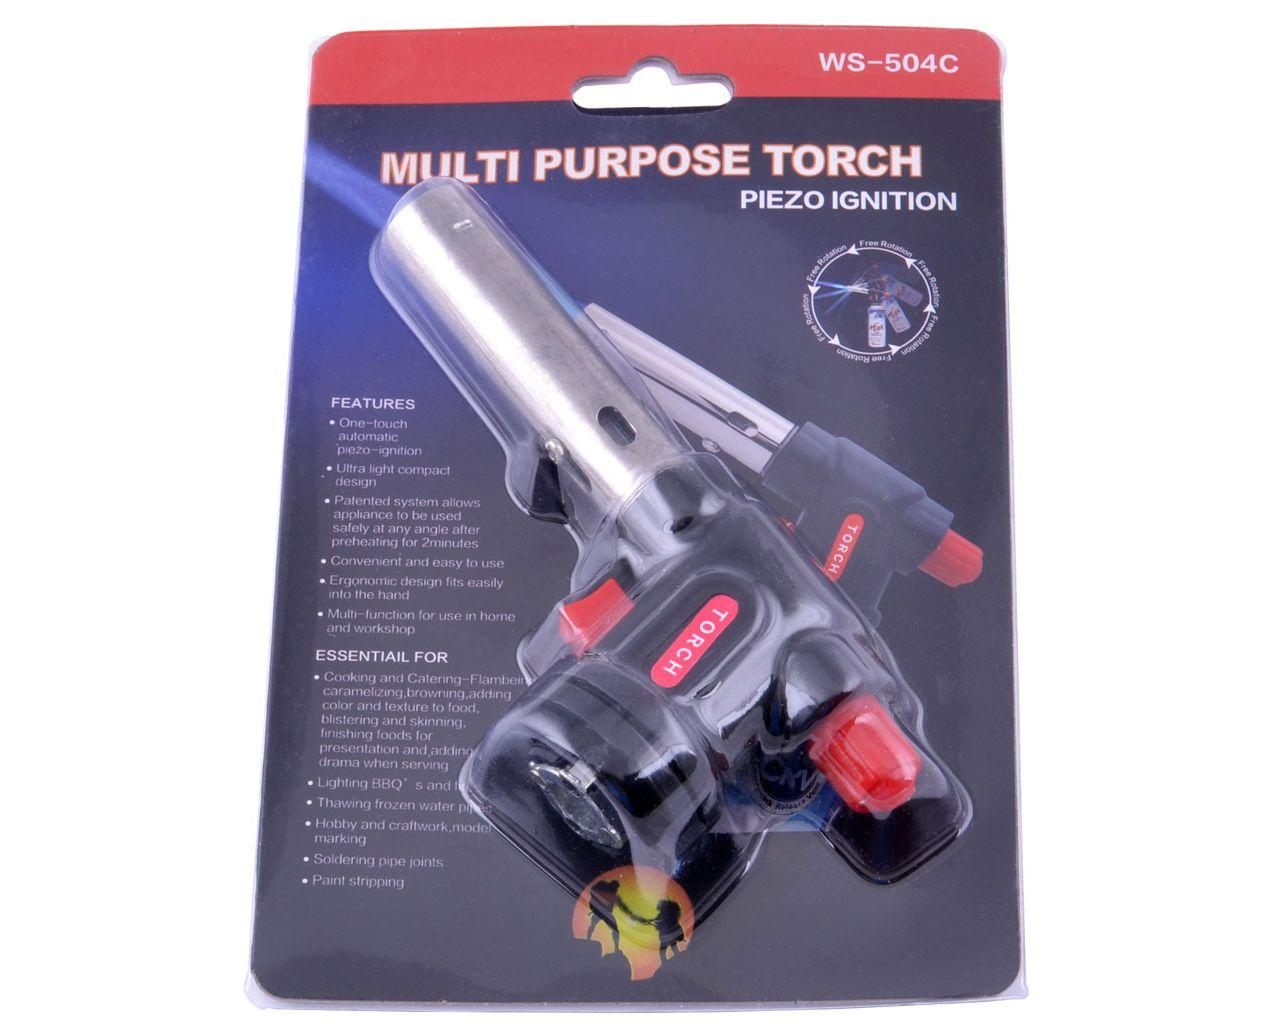 Горелка с пьезоподжигом Multi Purpose Torch